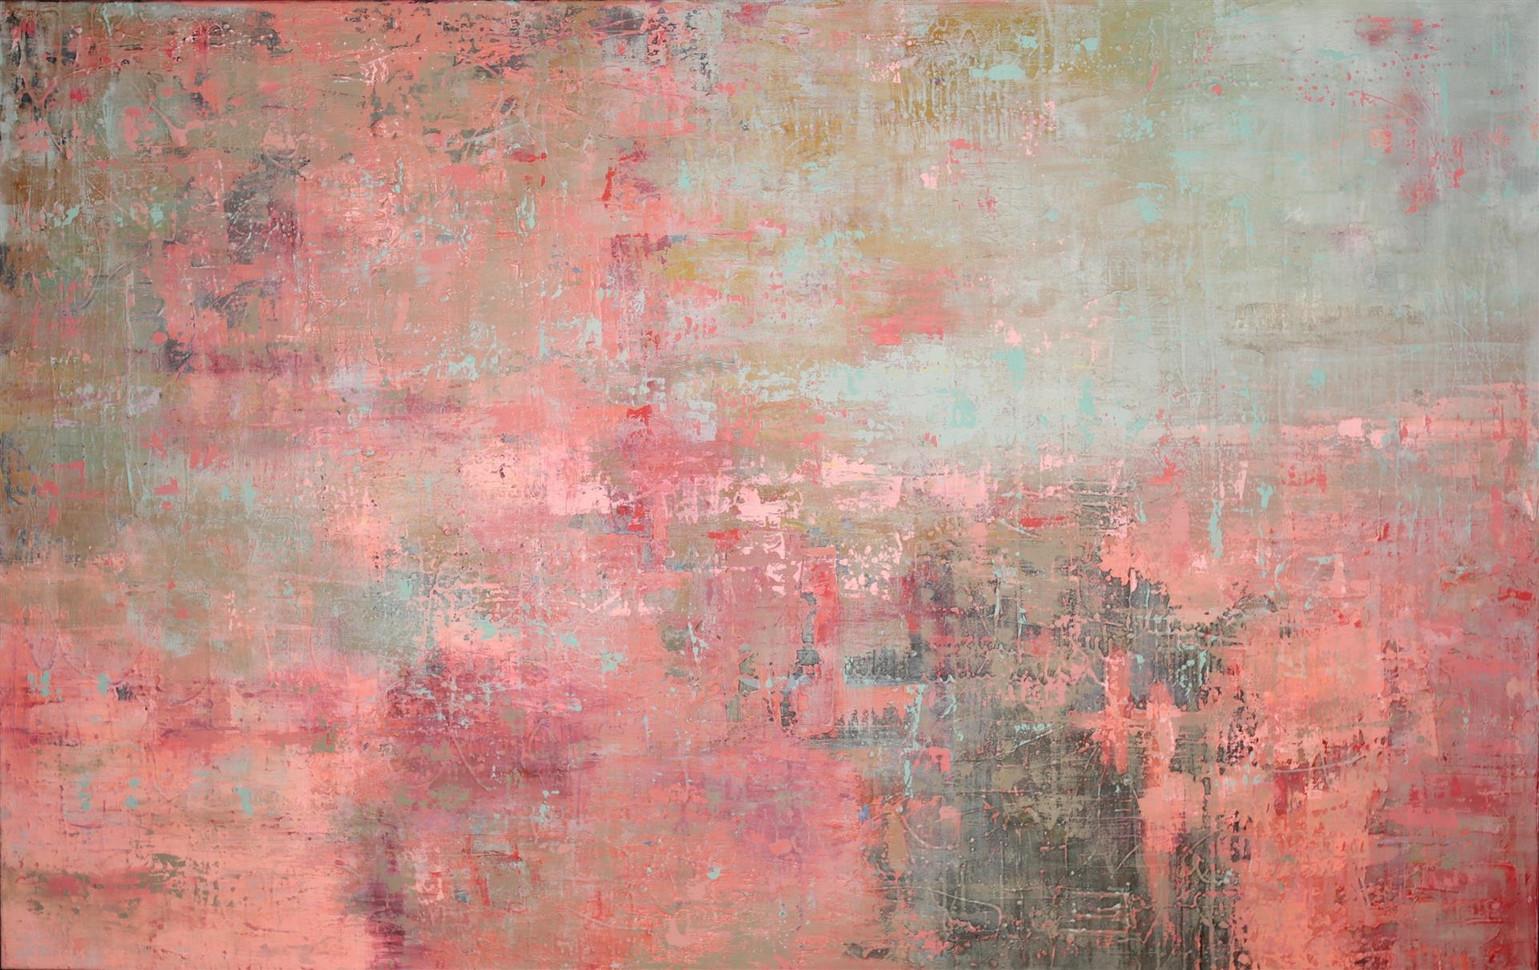 "Heidi Kinzie (Modesto), Redolent, 2019 Oil on canvas with a cold wax veil, 66"" x 42"" $4,500"